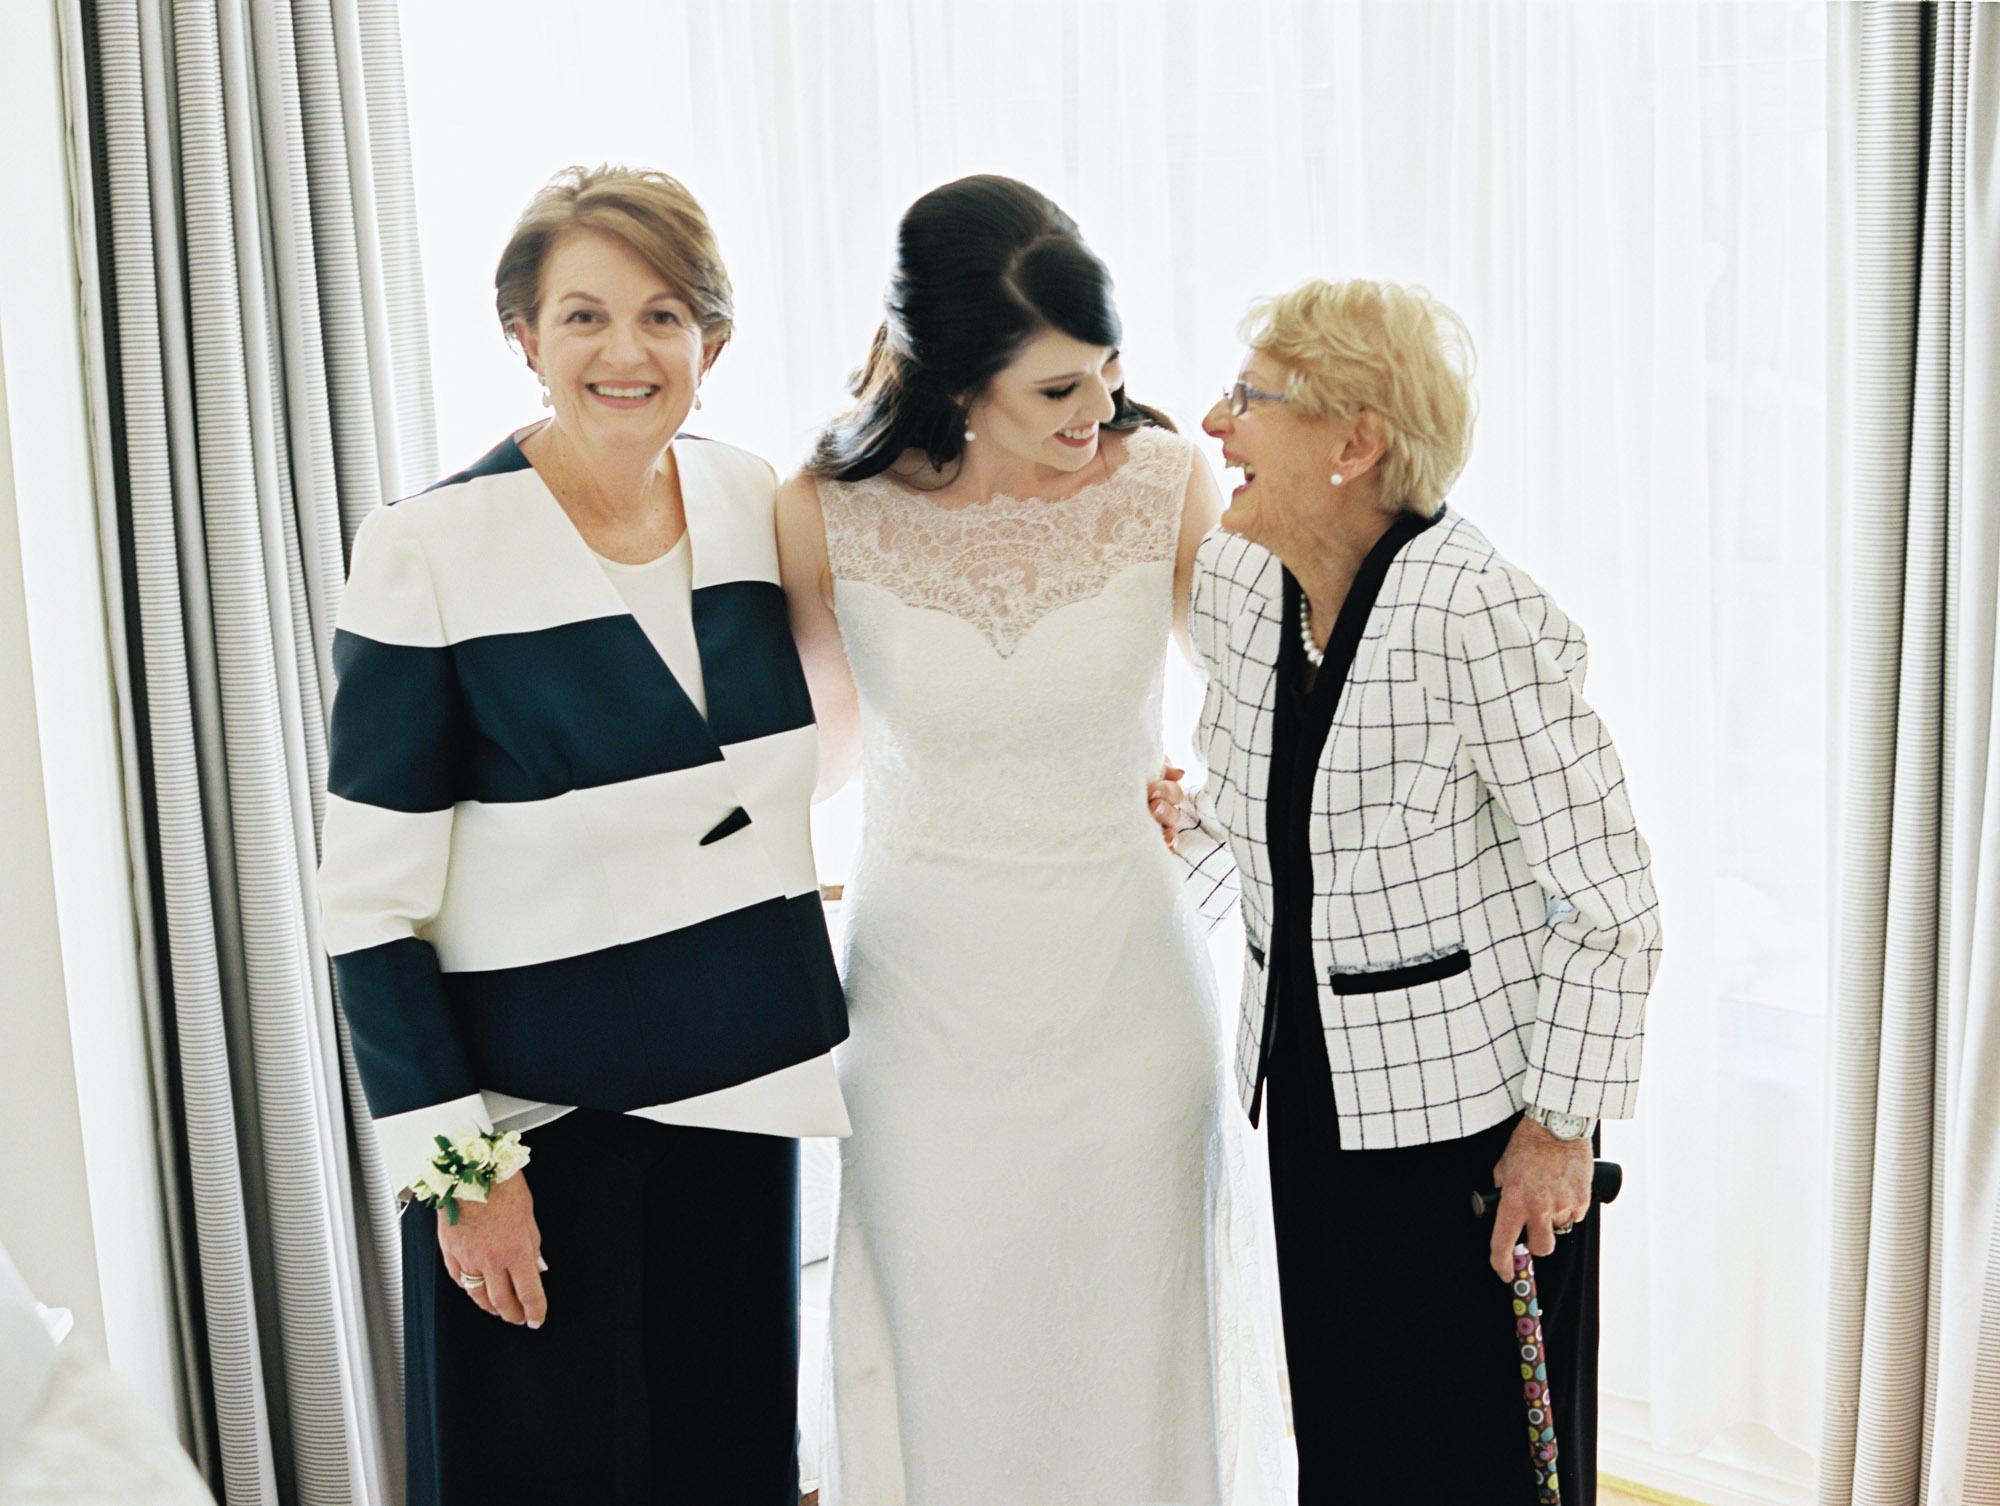 Glen-Ewin-Estate-wedding-photography-026.jpg